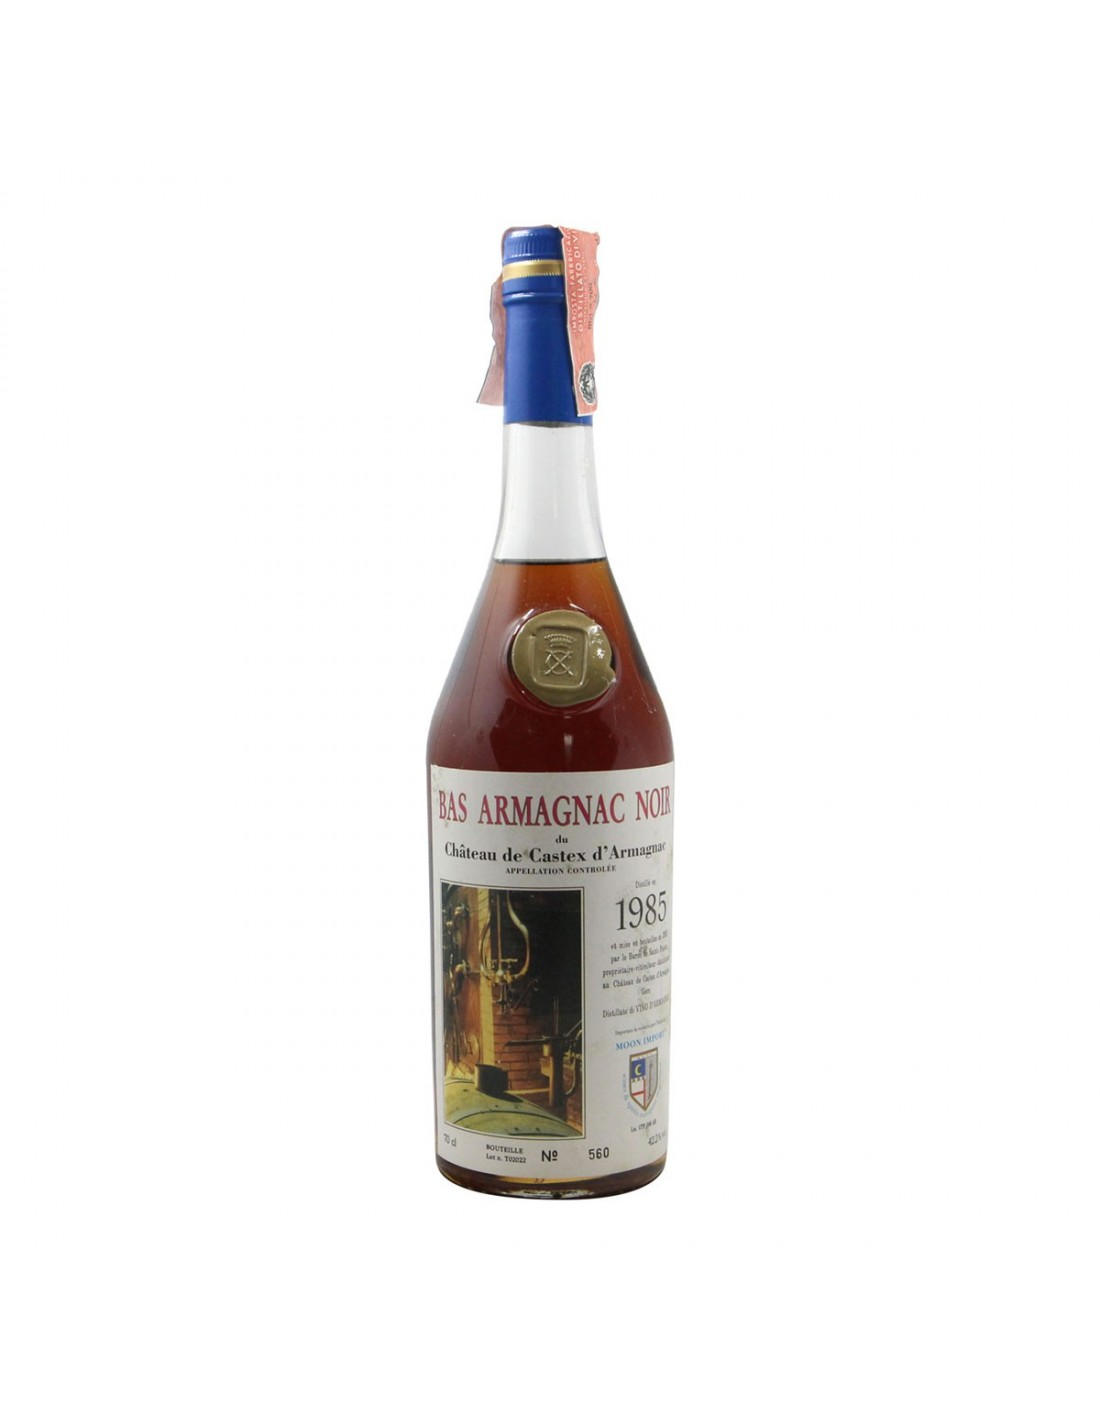 BAS ARMAGNAC NOIR 1985 CHATEAU DE CASTEX Grandi Bottiglie